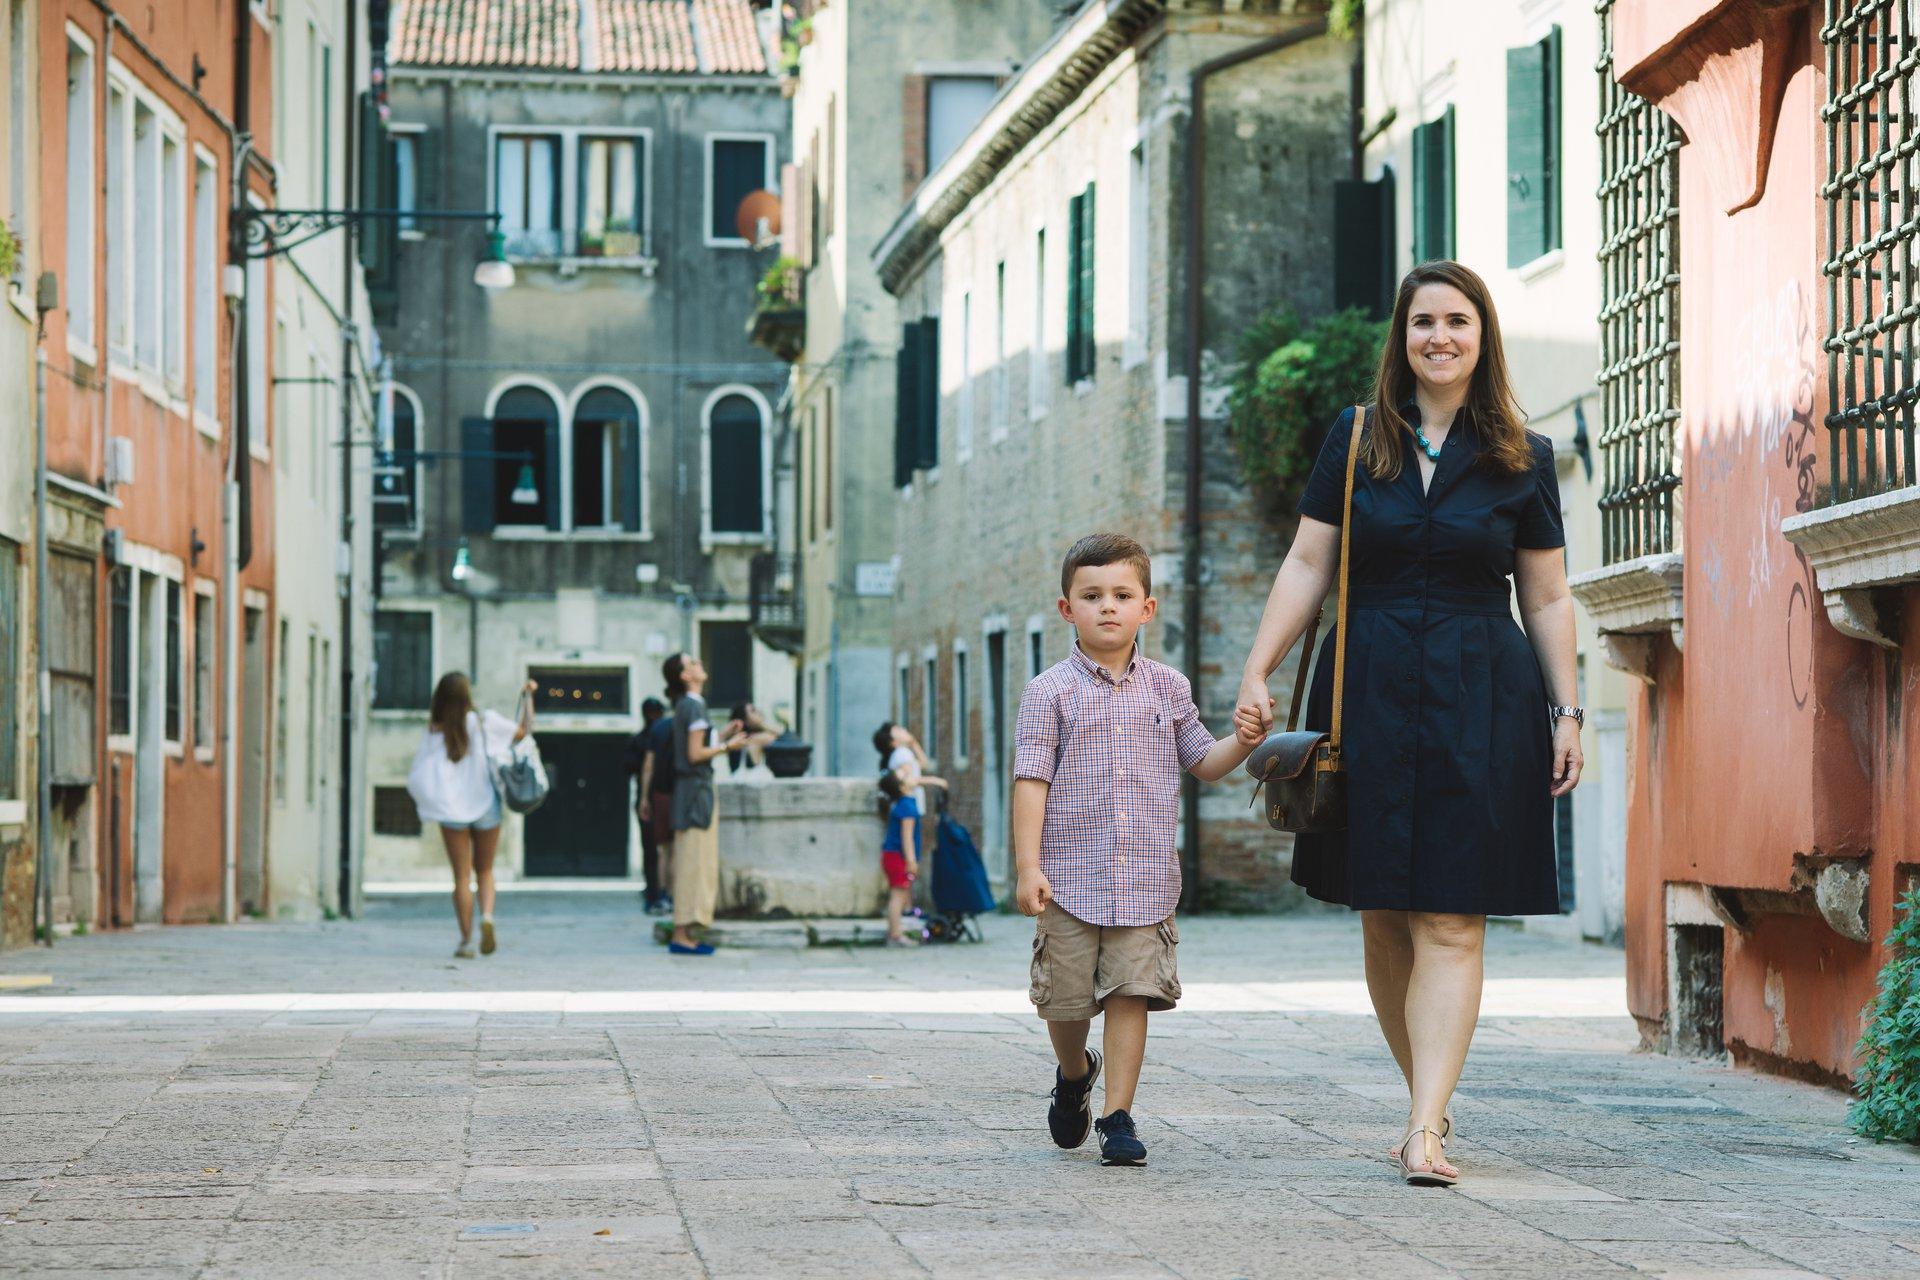 Venice-Italy-travel-story-Flytographer-19